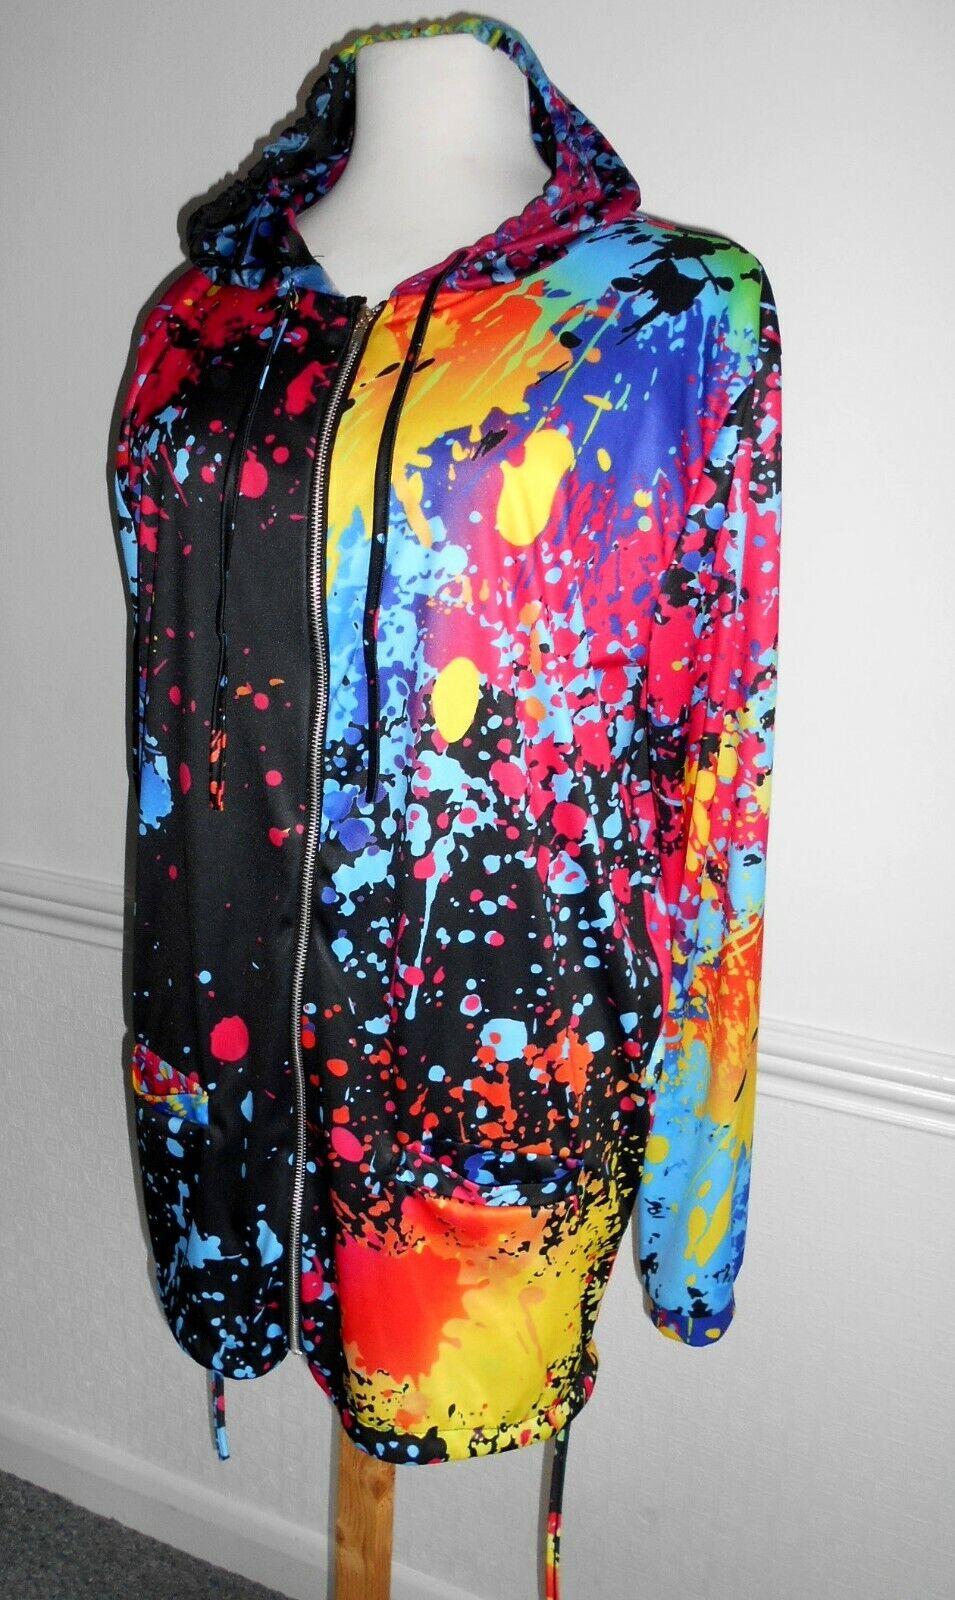 Unisex Unbranded festival hooded jacket bright splashes of colour pockets 4xl